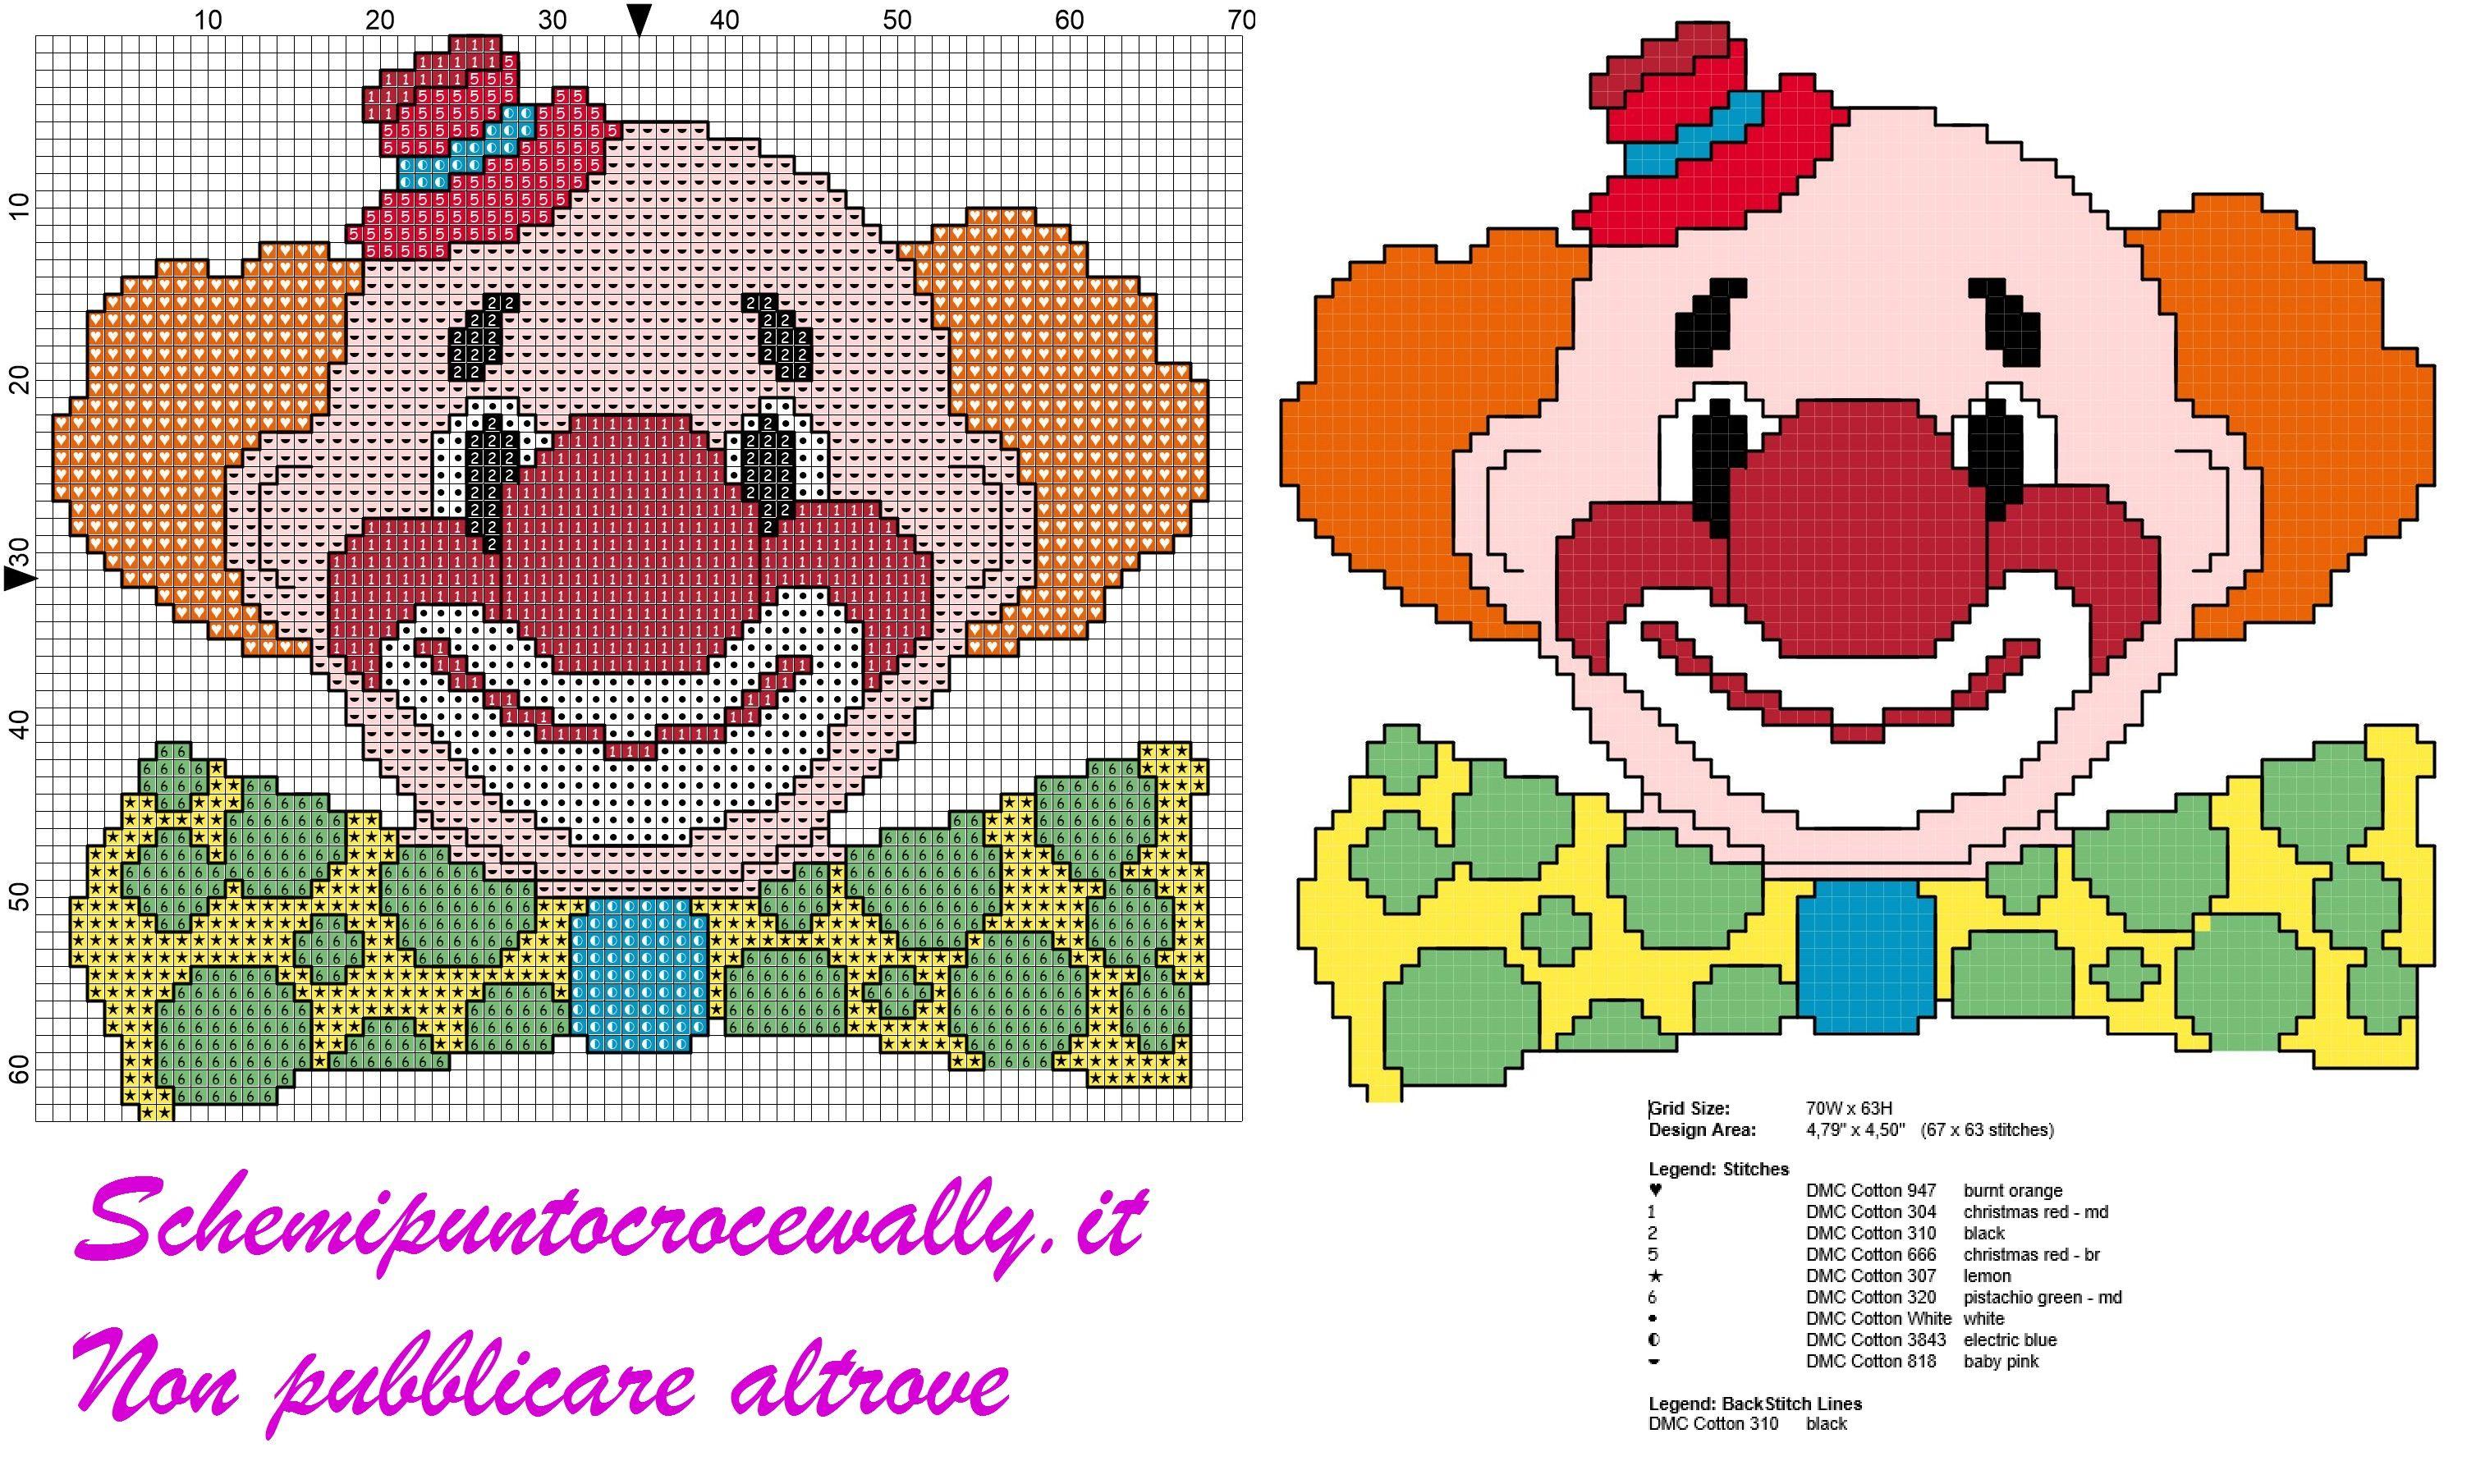 Schema punto croce gratis per bambini viso pagliaccio for Farfalle a punto croce per bambini